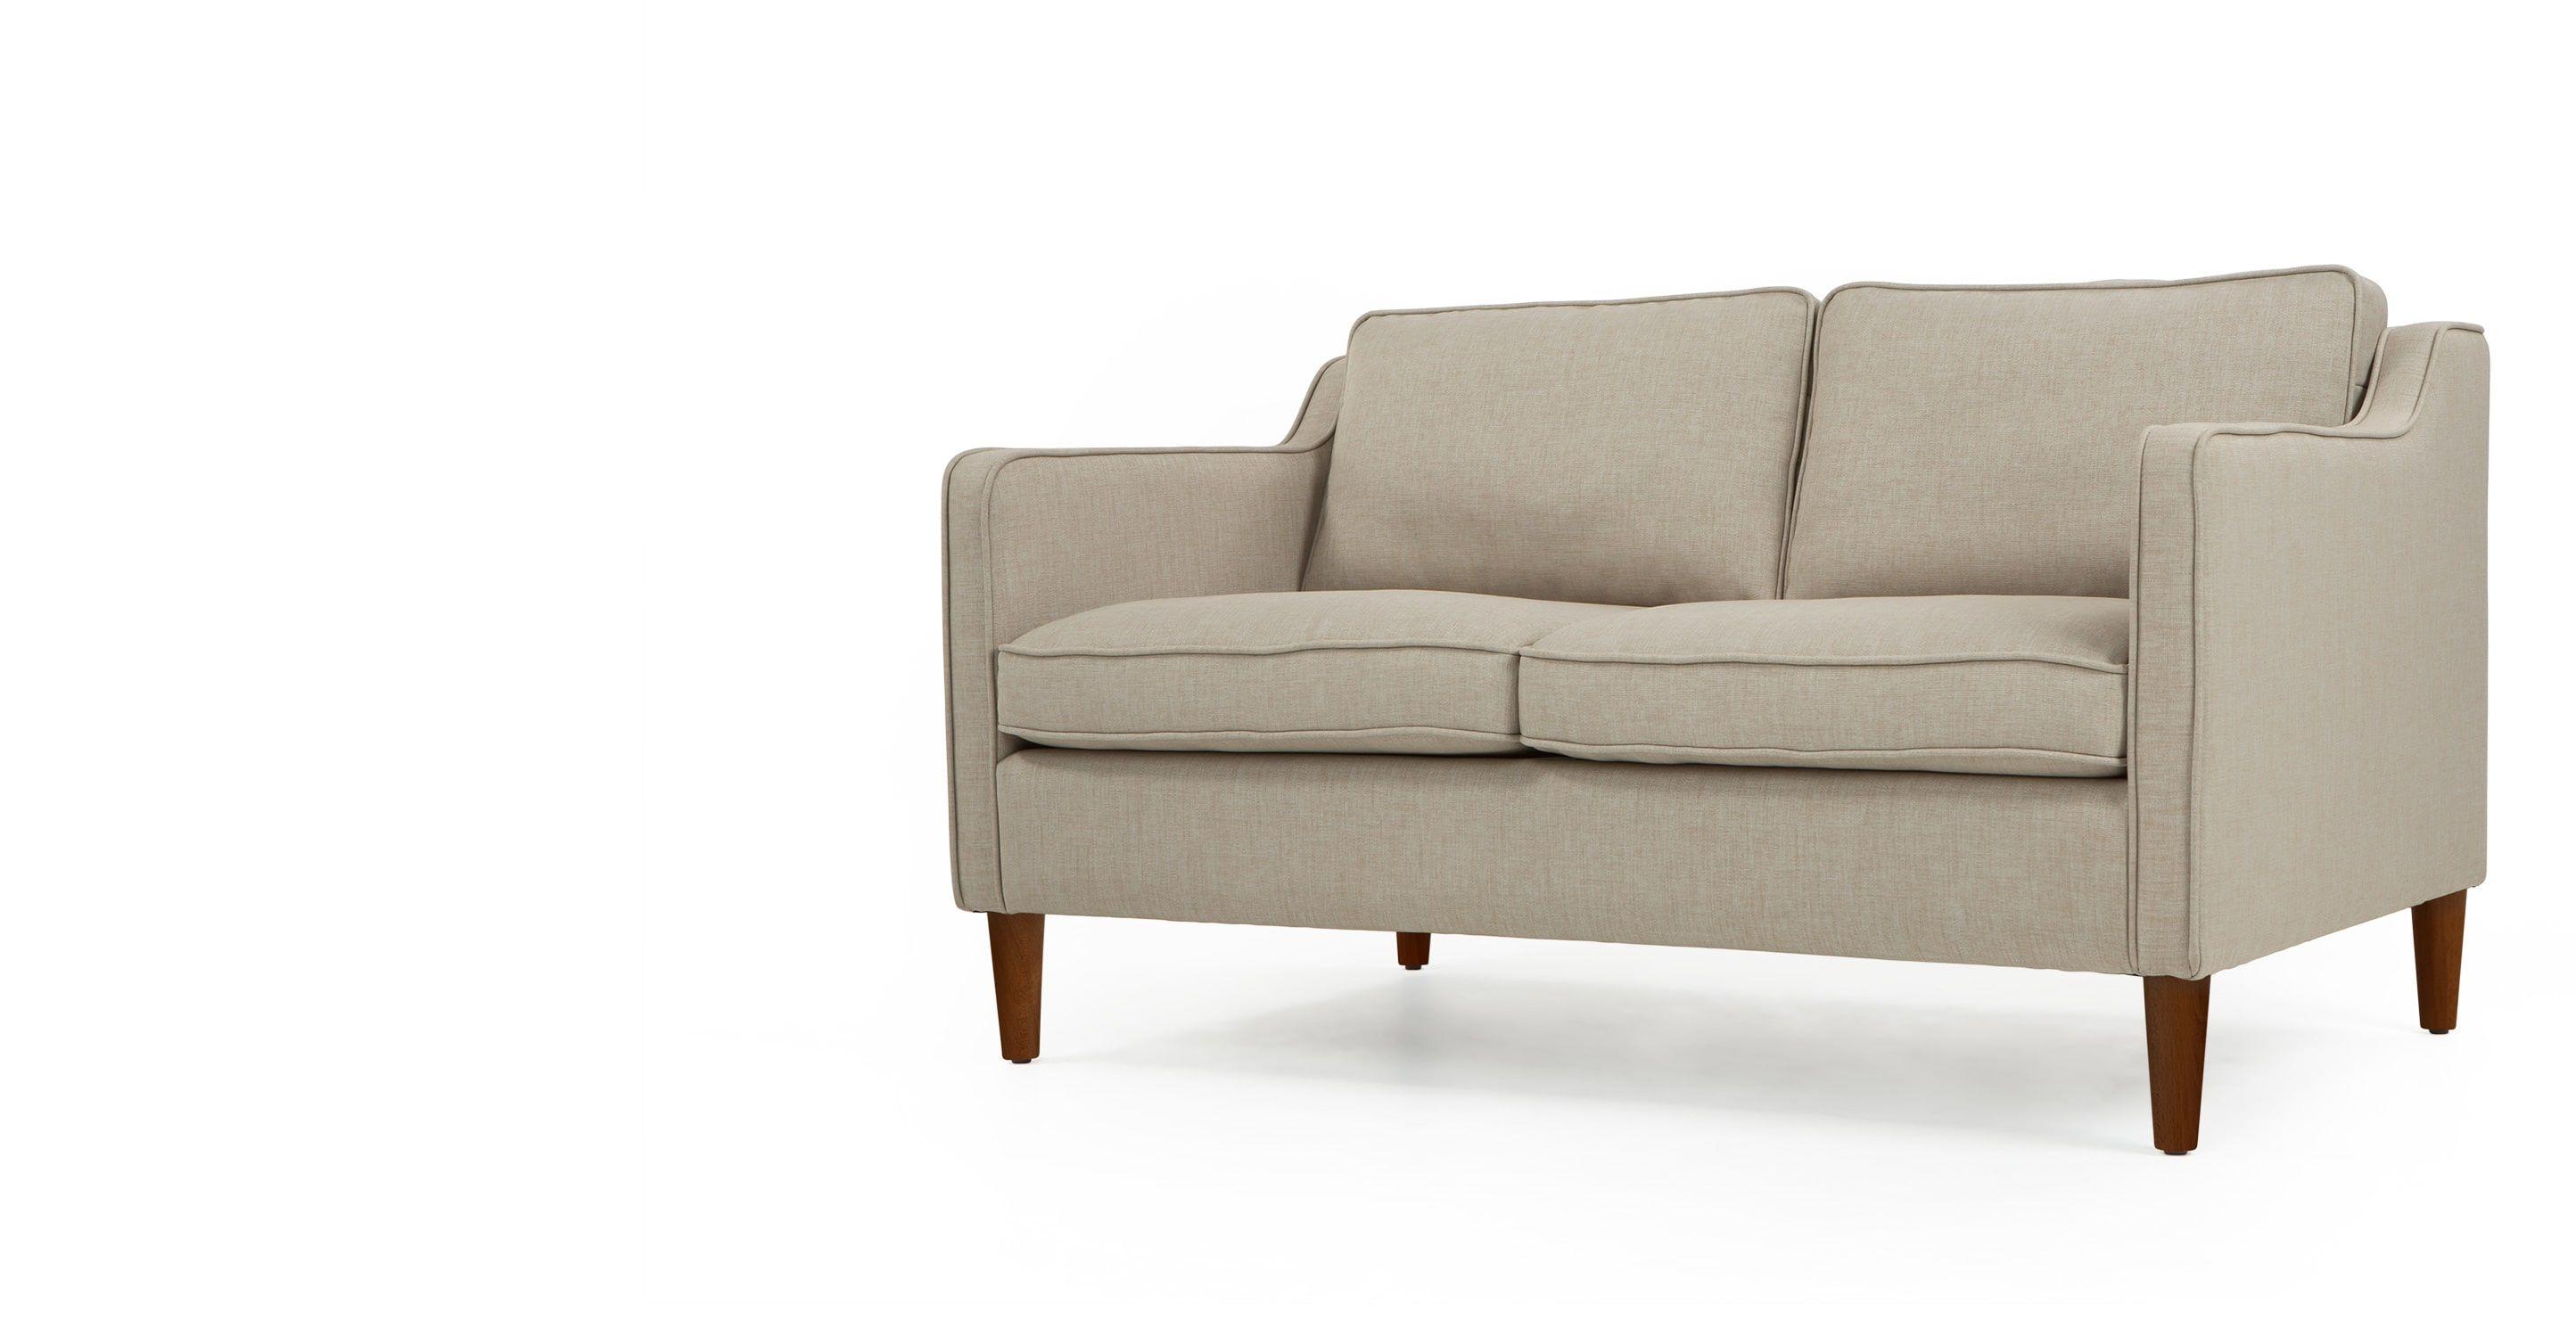 Walken 2 Seater Sofa, Calico Beige